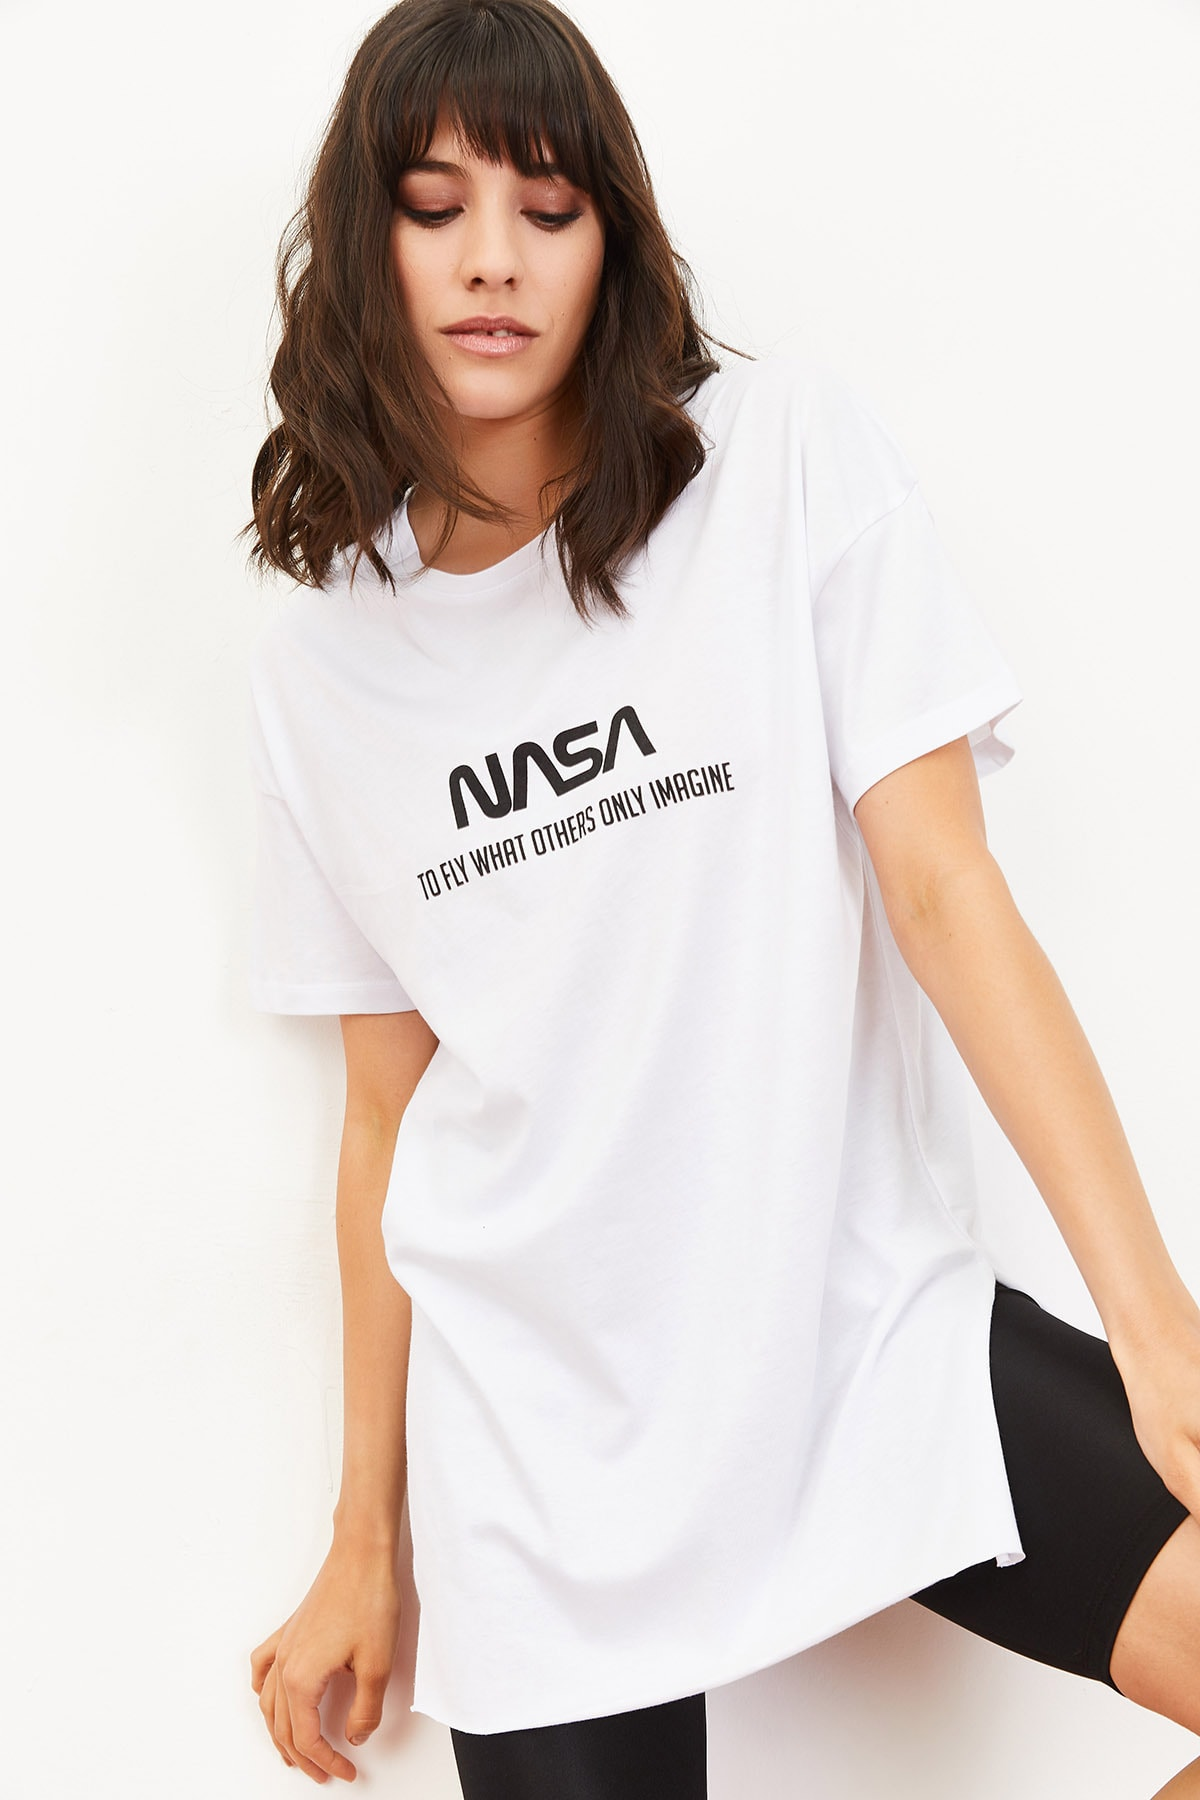 Bianco Lucci Kadın Nasa Baskılı Yan Yırtmaçlı Salaş T-Shirt Beyaz 10061024 4